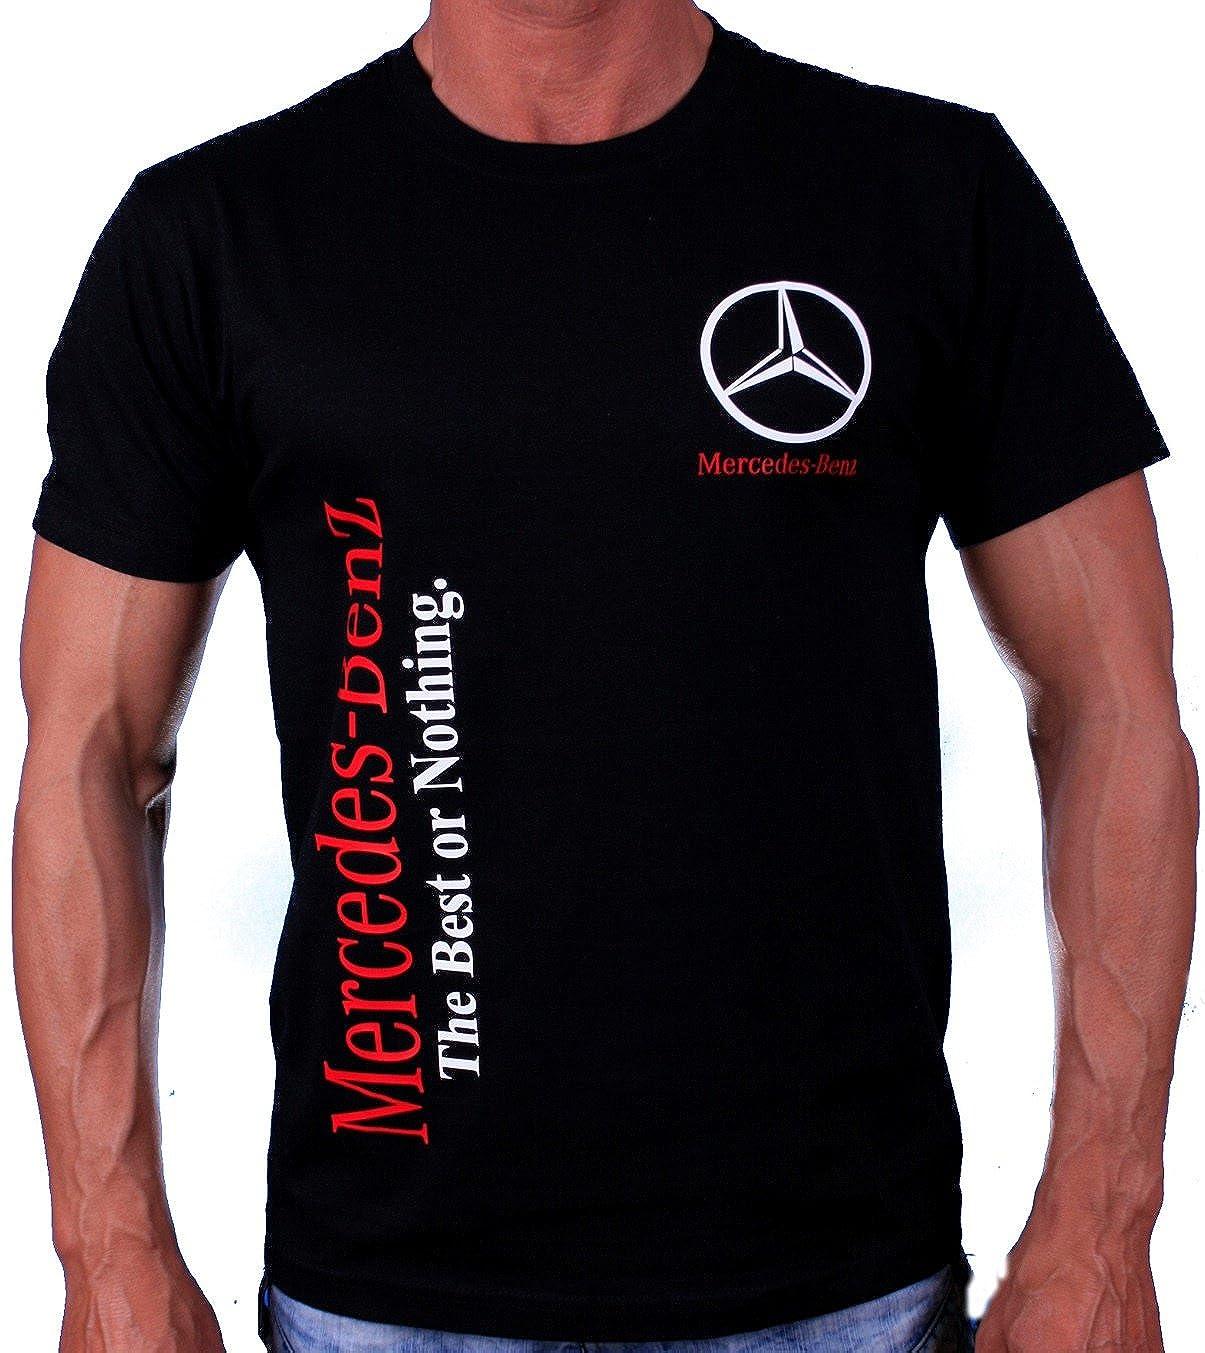 T-Shirt The Best or Nothing AMG Poloshirts Logo 63 55 65 Stickerei Binder Hemd Schwarzes Baumwolle T-Shirt Polo